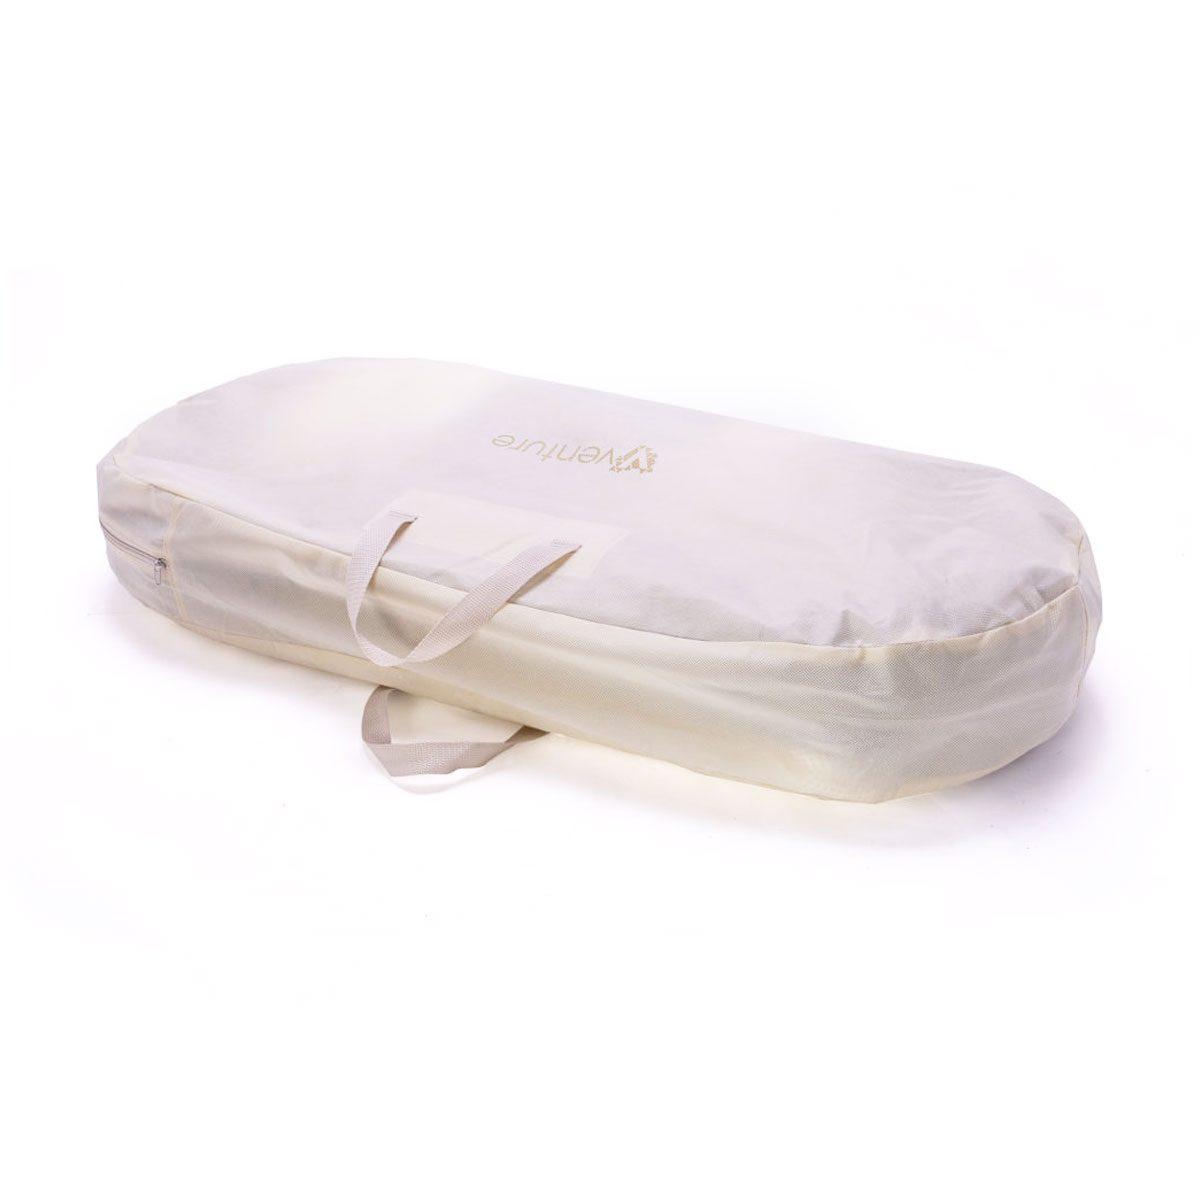 Venture baby nest carry bag